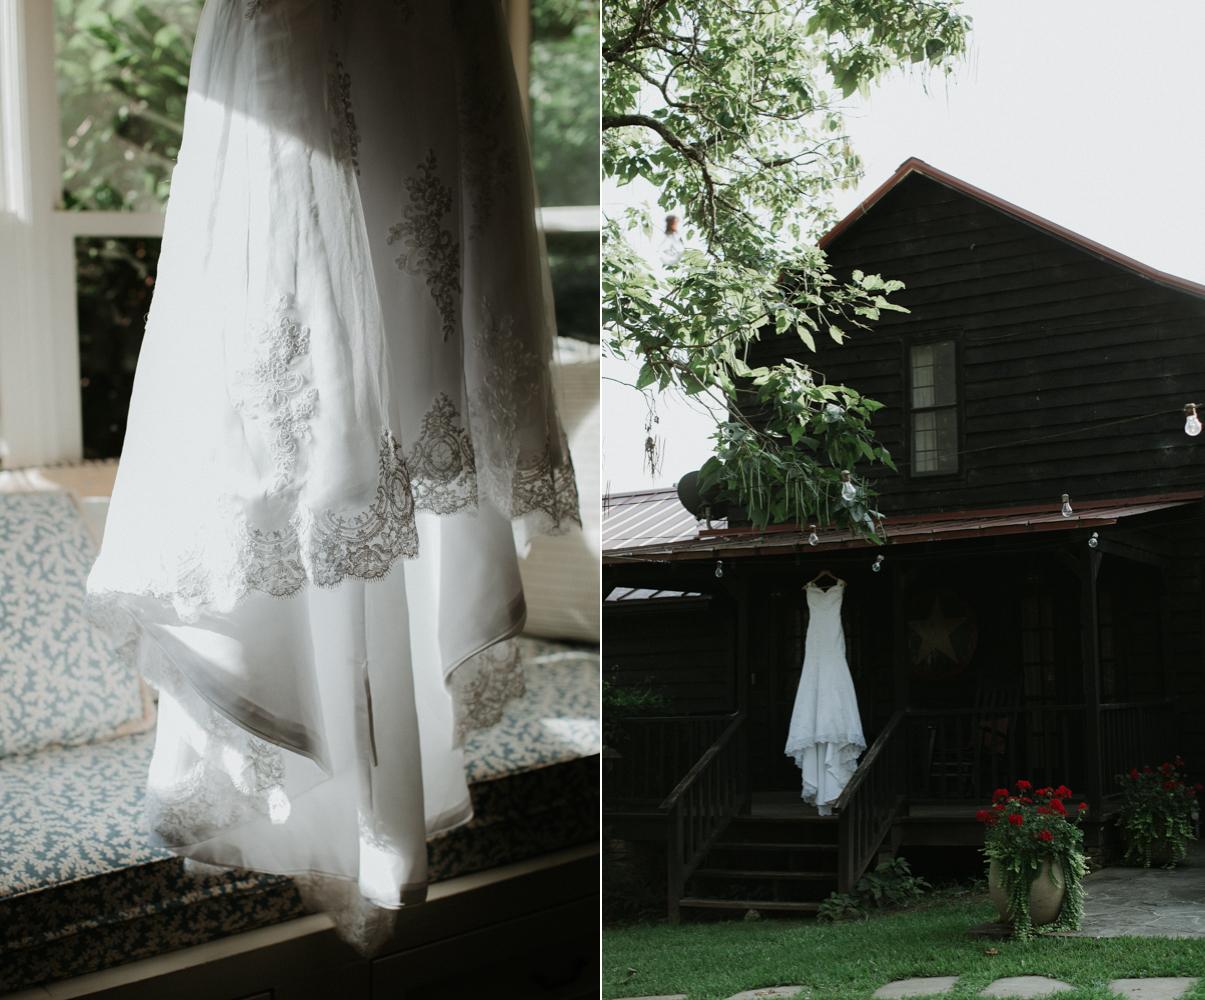 Atlanta_wedding_photographer_Inn_at_Serembe_intimate_elopement_sunset_artistic_photography_Gabriela_and_Felipe_doble4.jpg